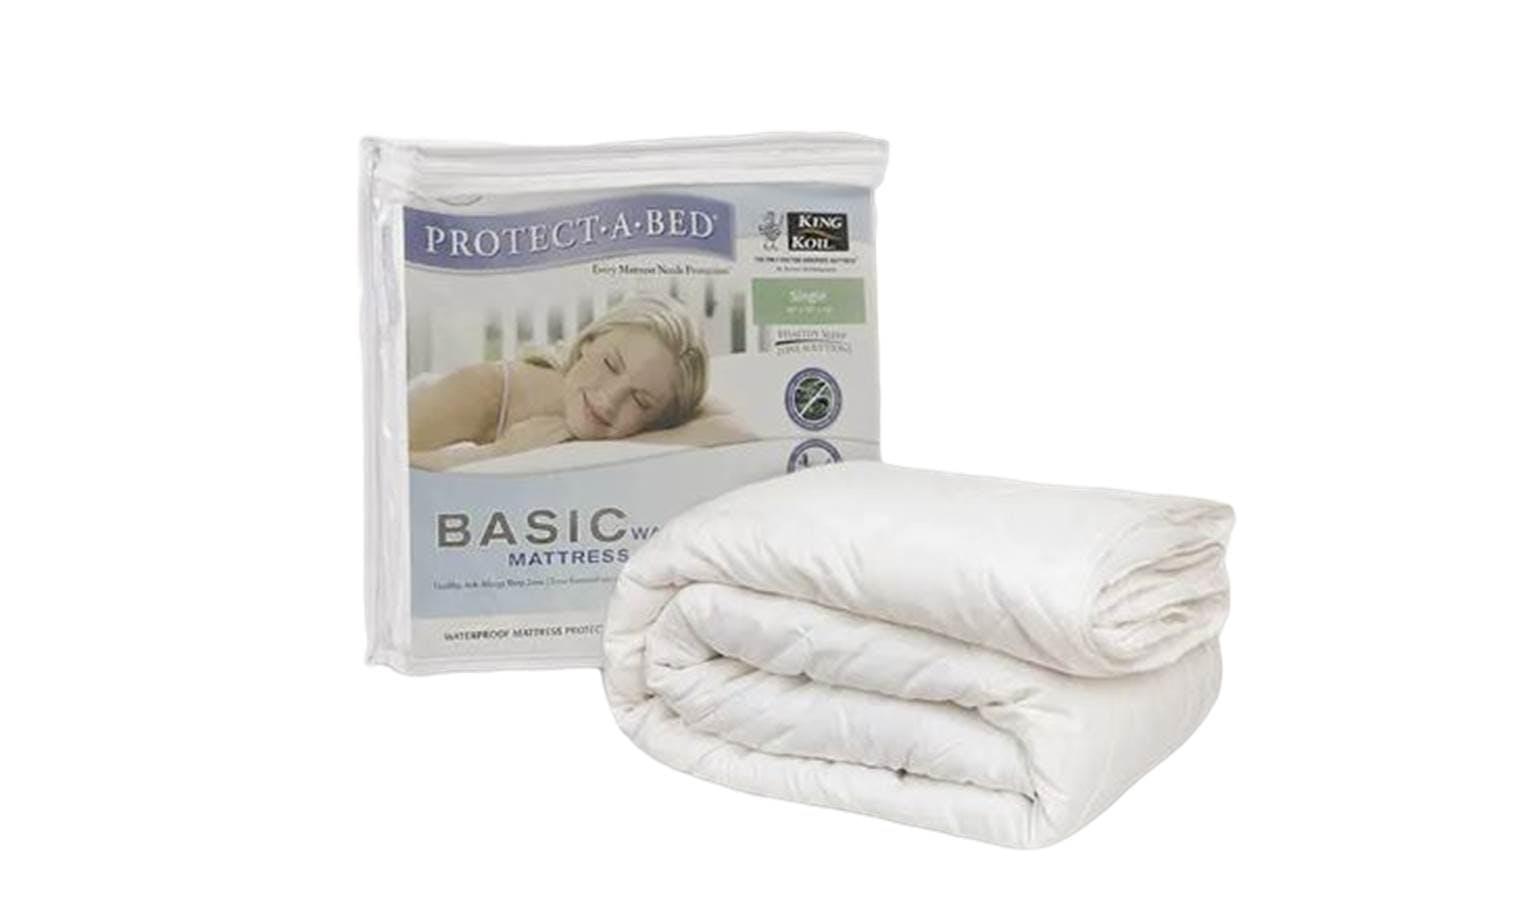 King Koil Protect A Bed Basic Mattress